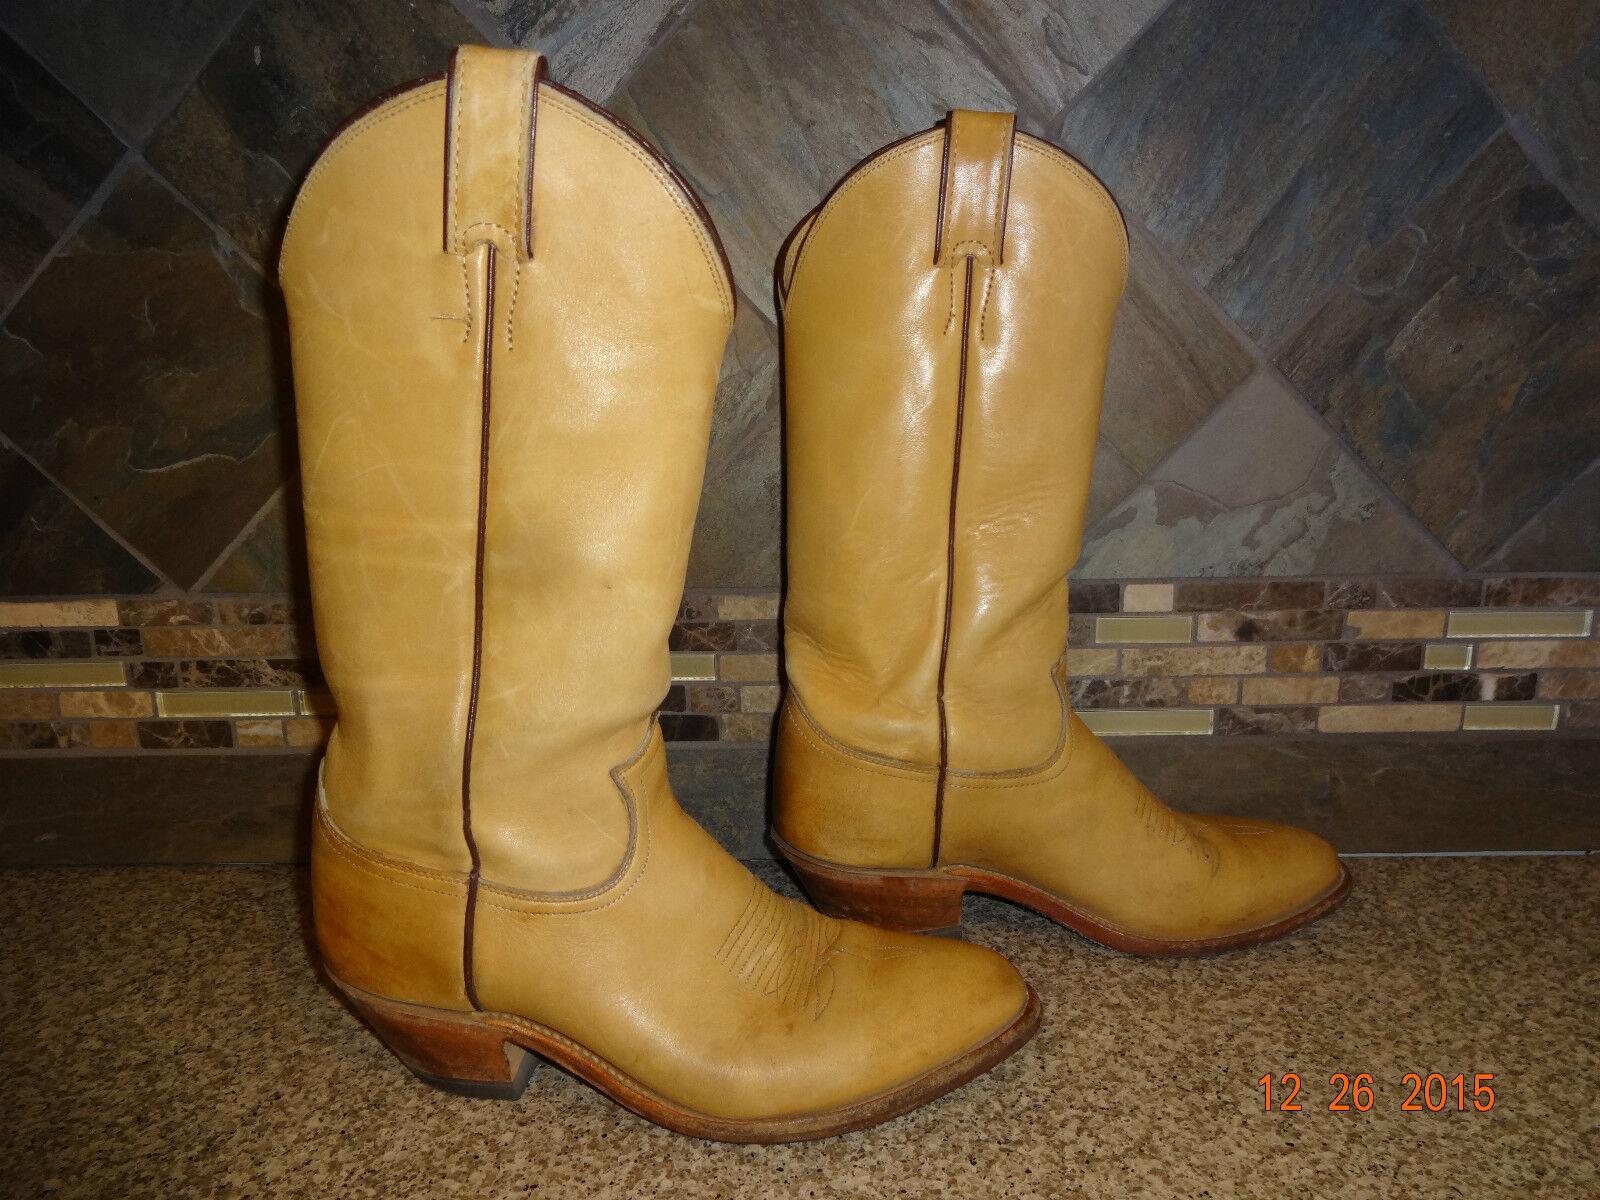 Uomo JUSTIN Sz 7.5D Style #1106 Tan/Camel ALL Pelle Cowboy Stivali